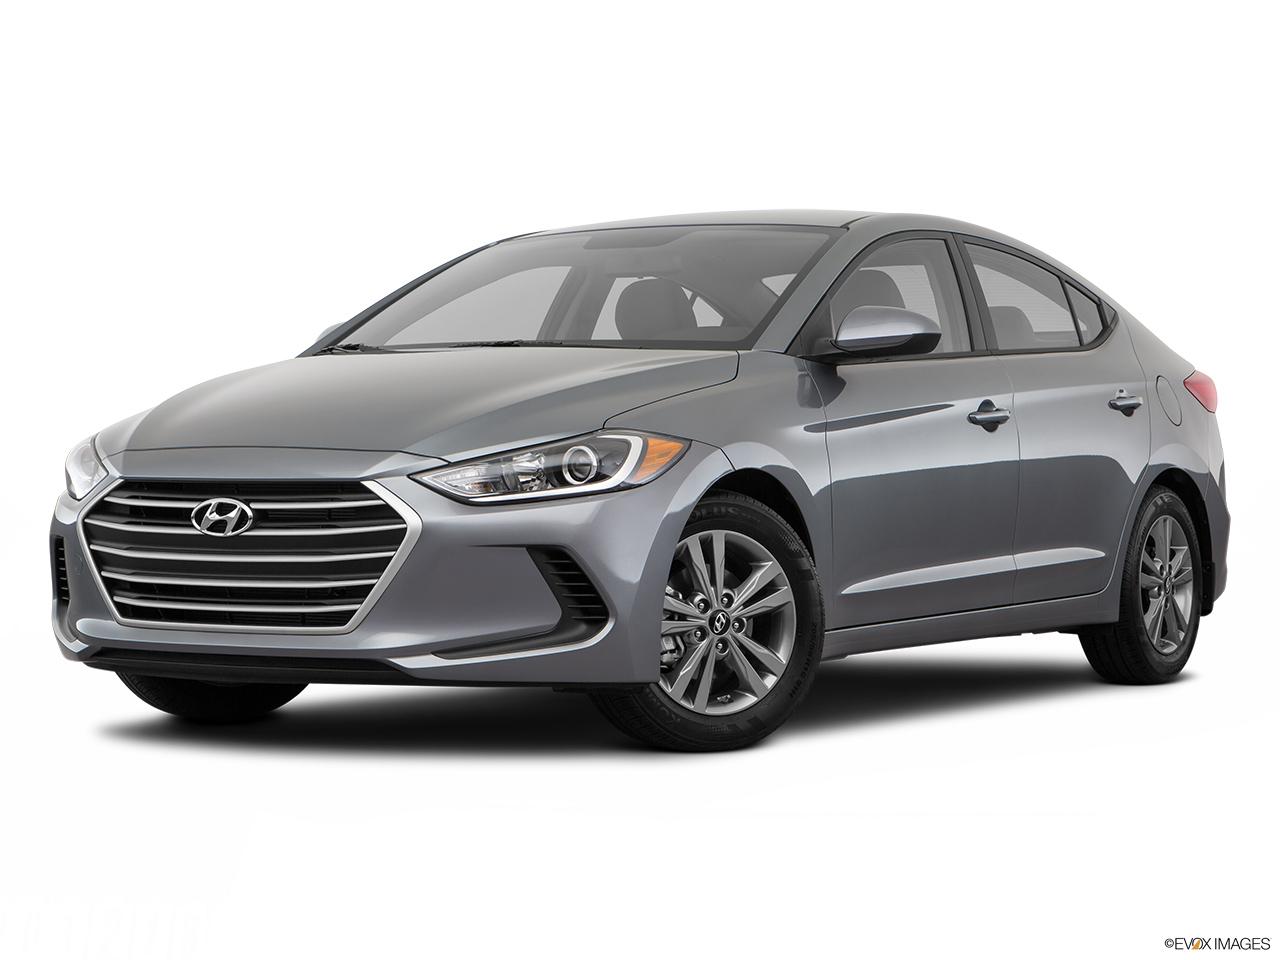 Lease A 2018 Hyundai Elantra L Manual 2wd In Canada